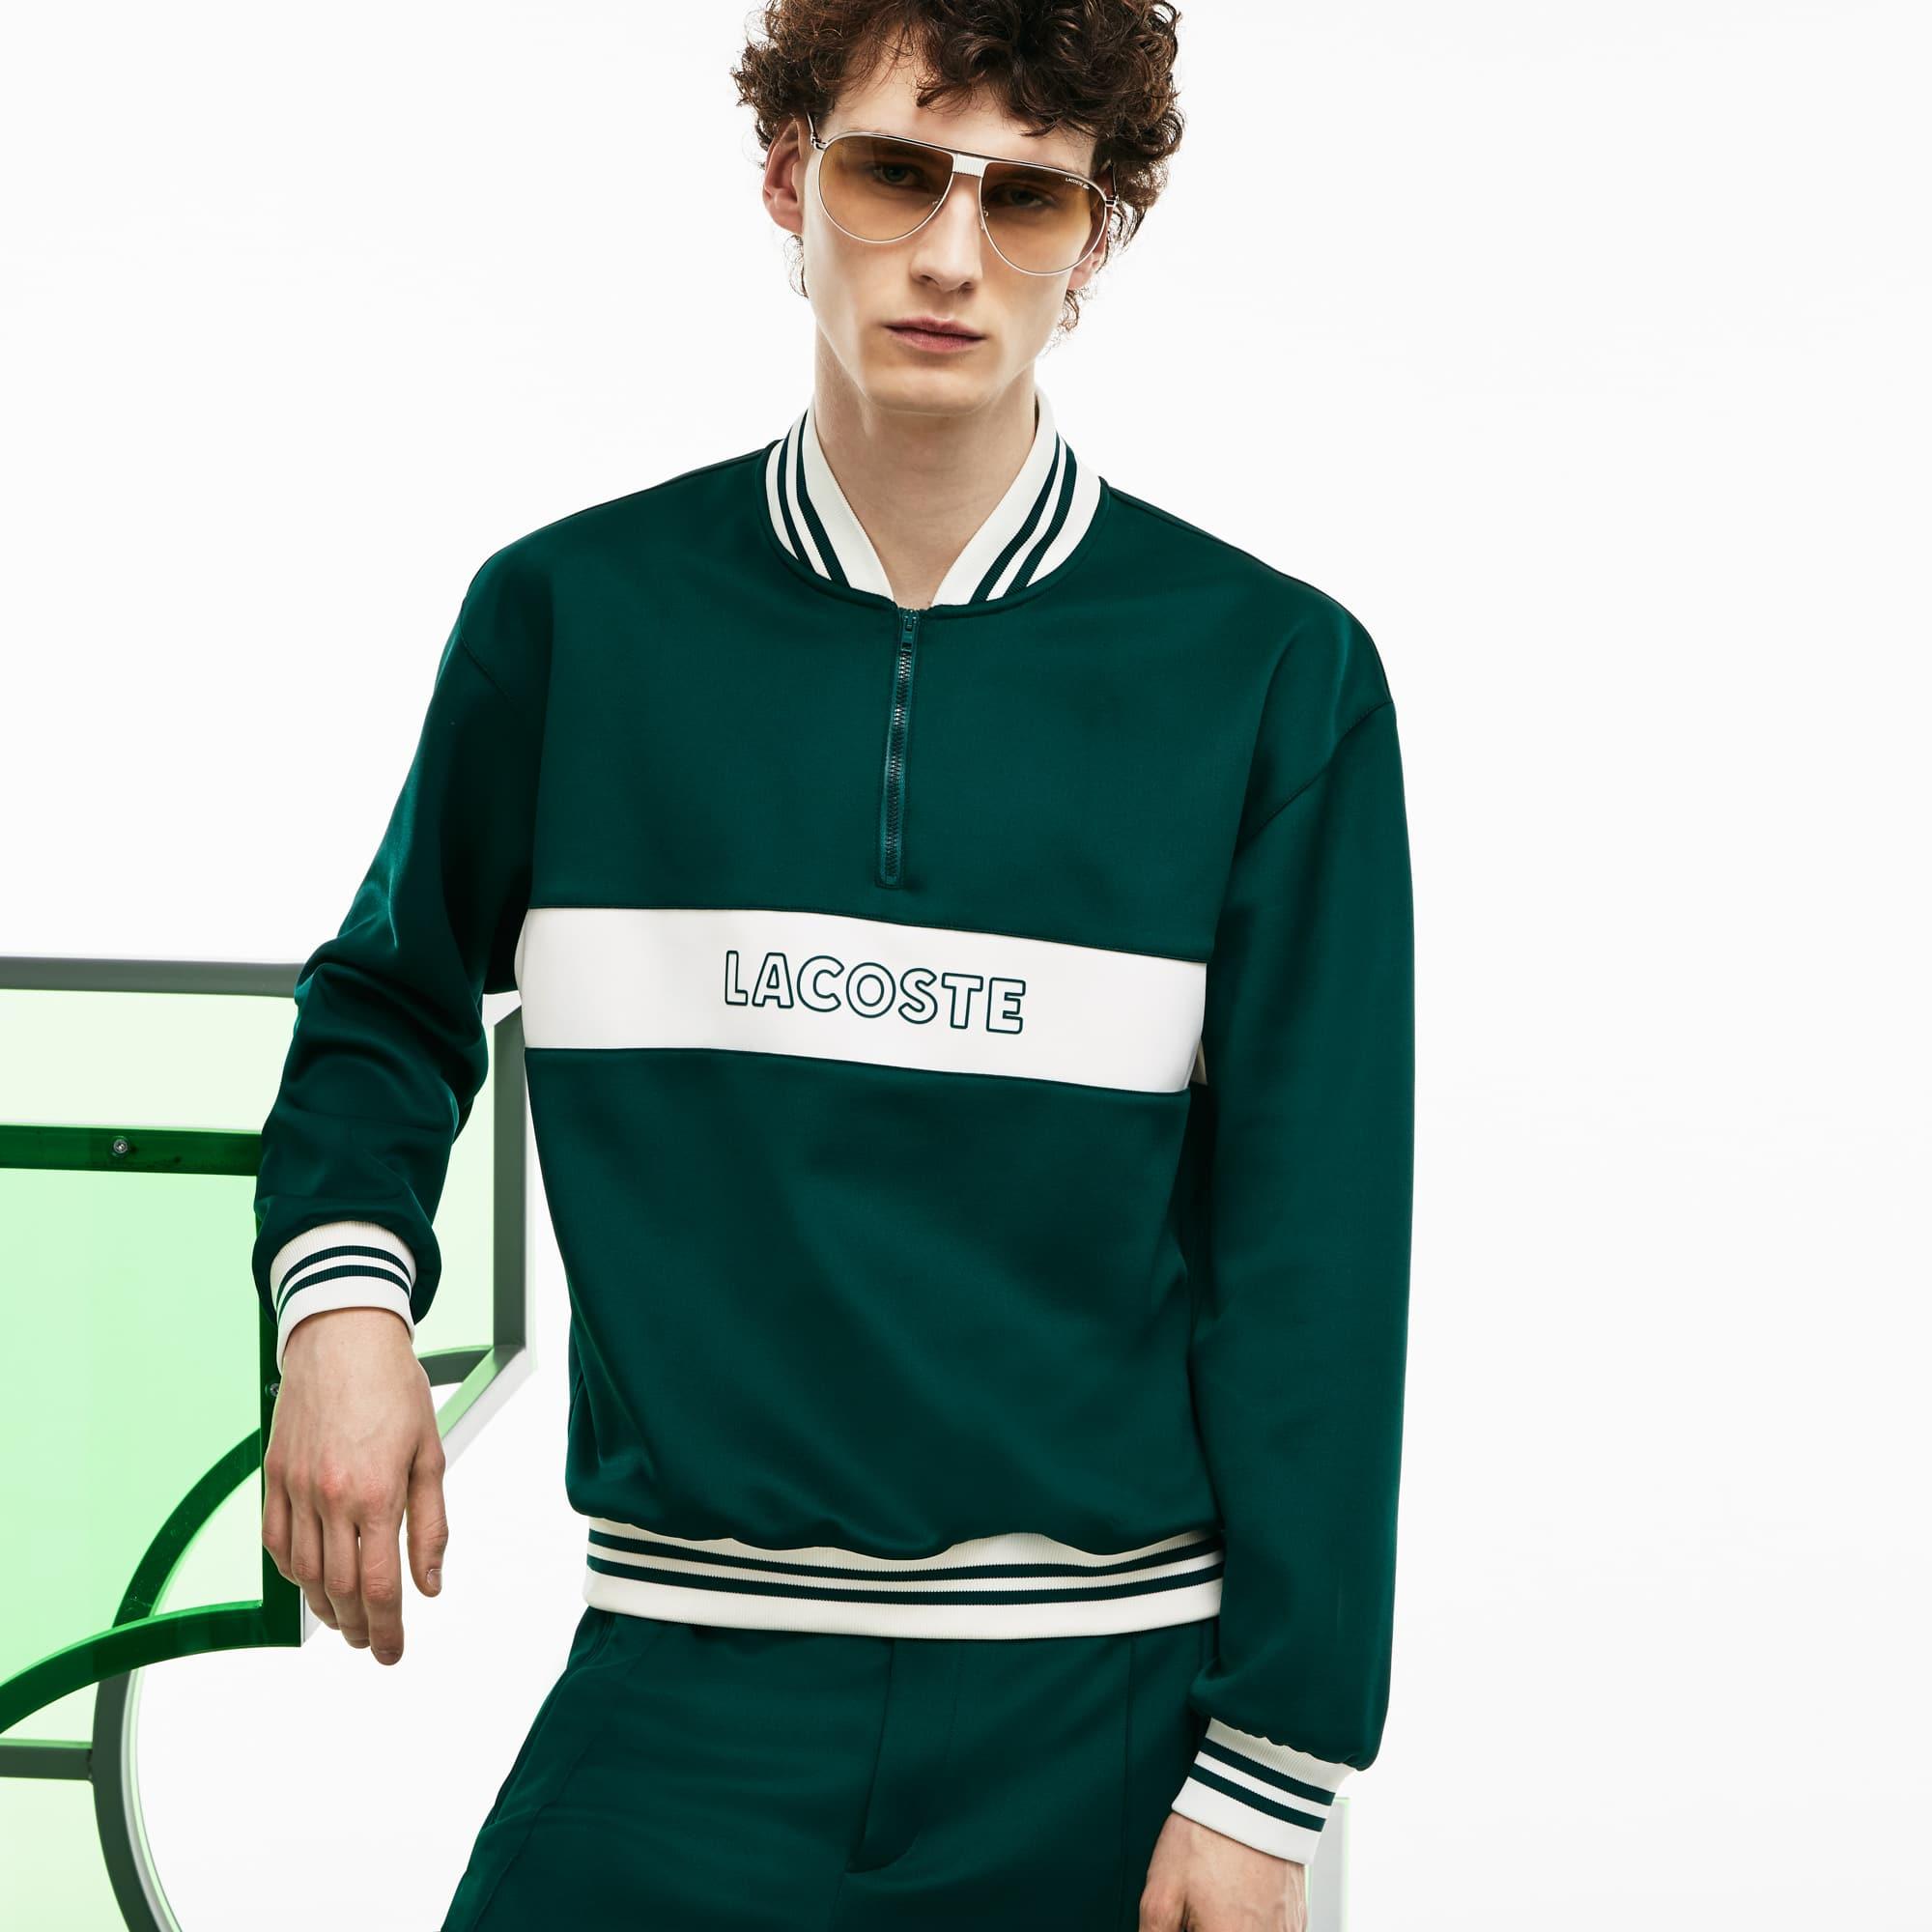 Men's Fashion Show Zippered Banana Collar Neoprene Sweatshirt